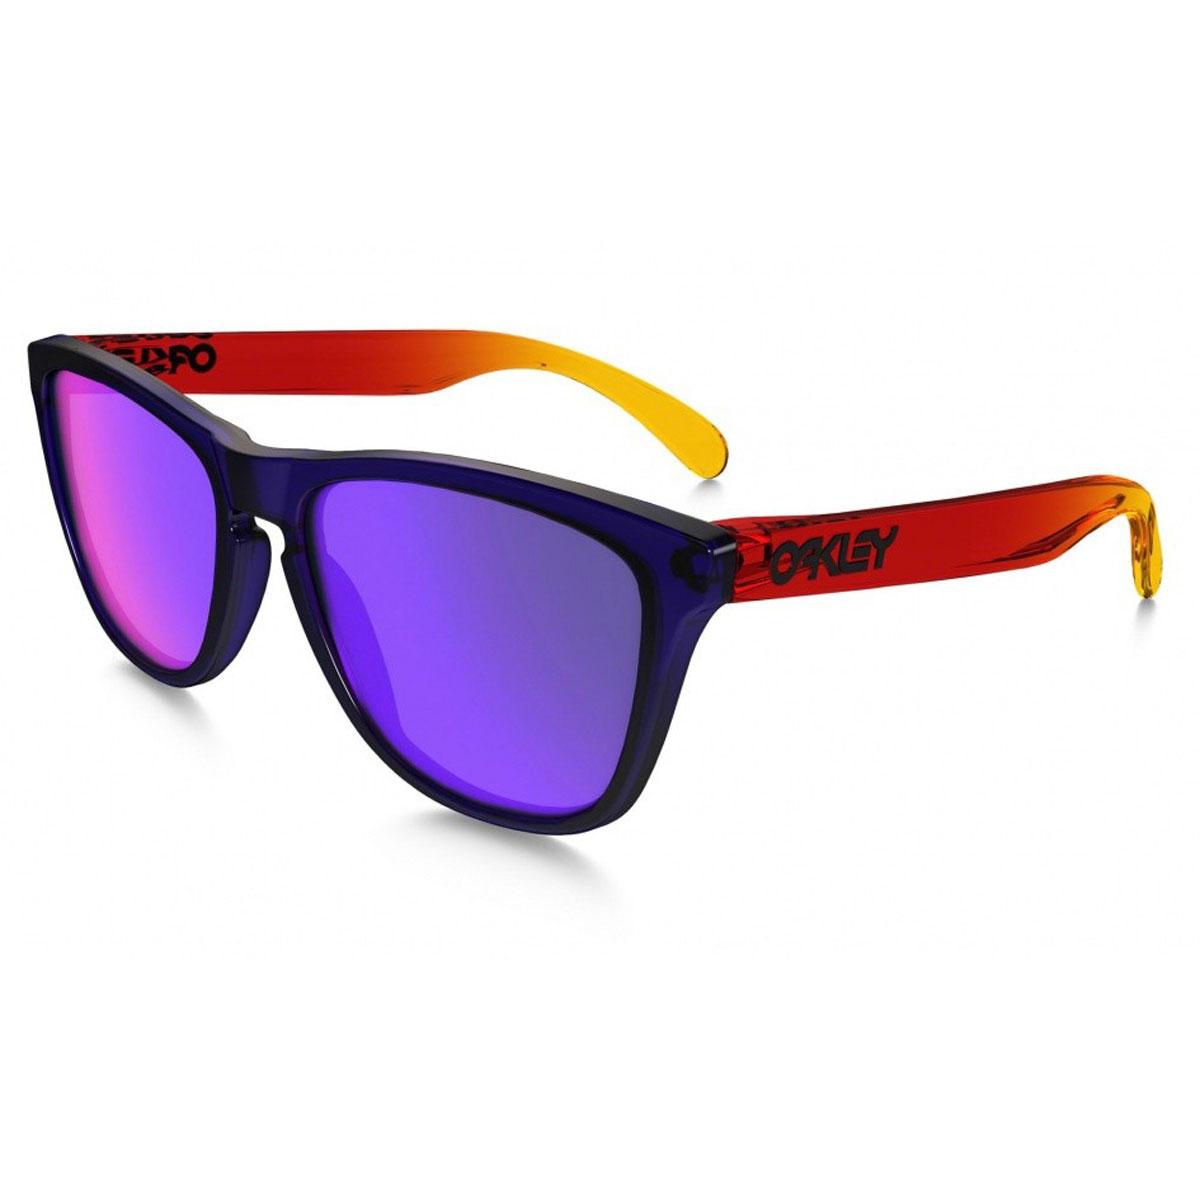 5cecb37ffe Sentinel Oakley Sunglasses - Frogskins - Surf Purple